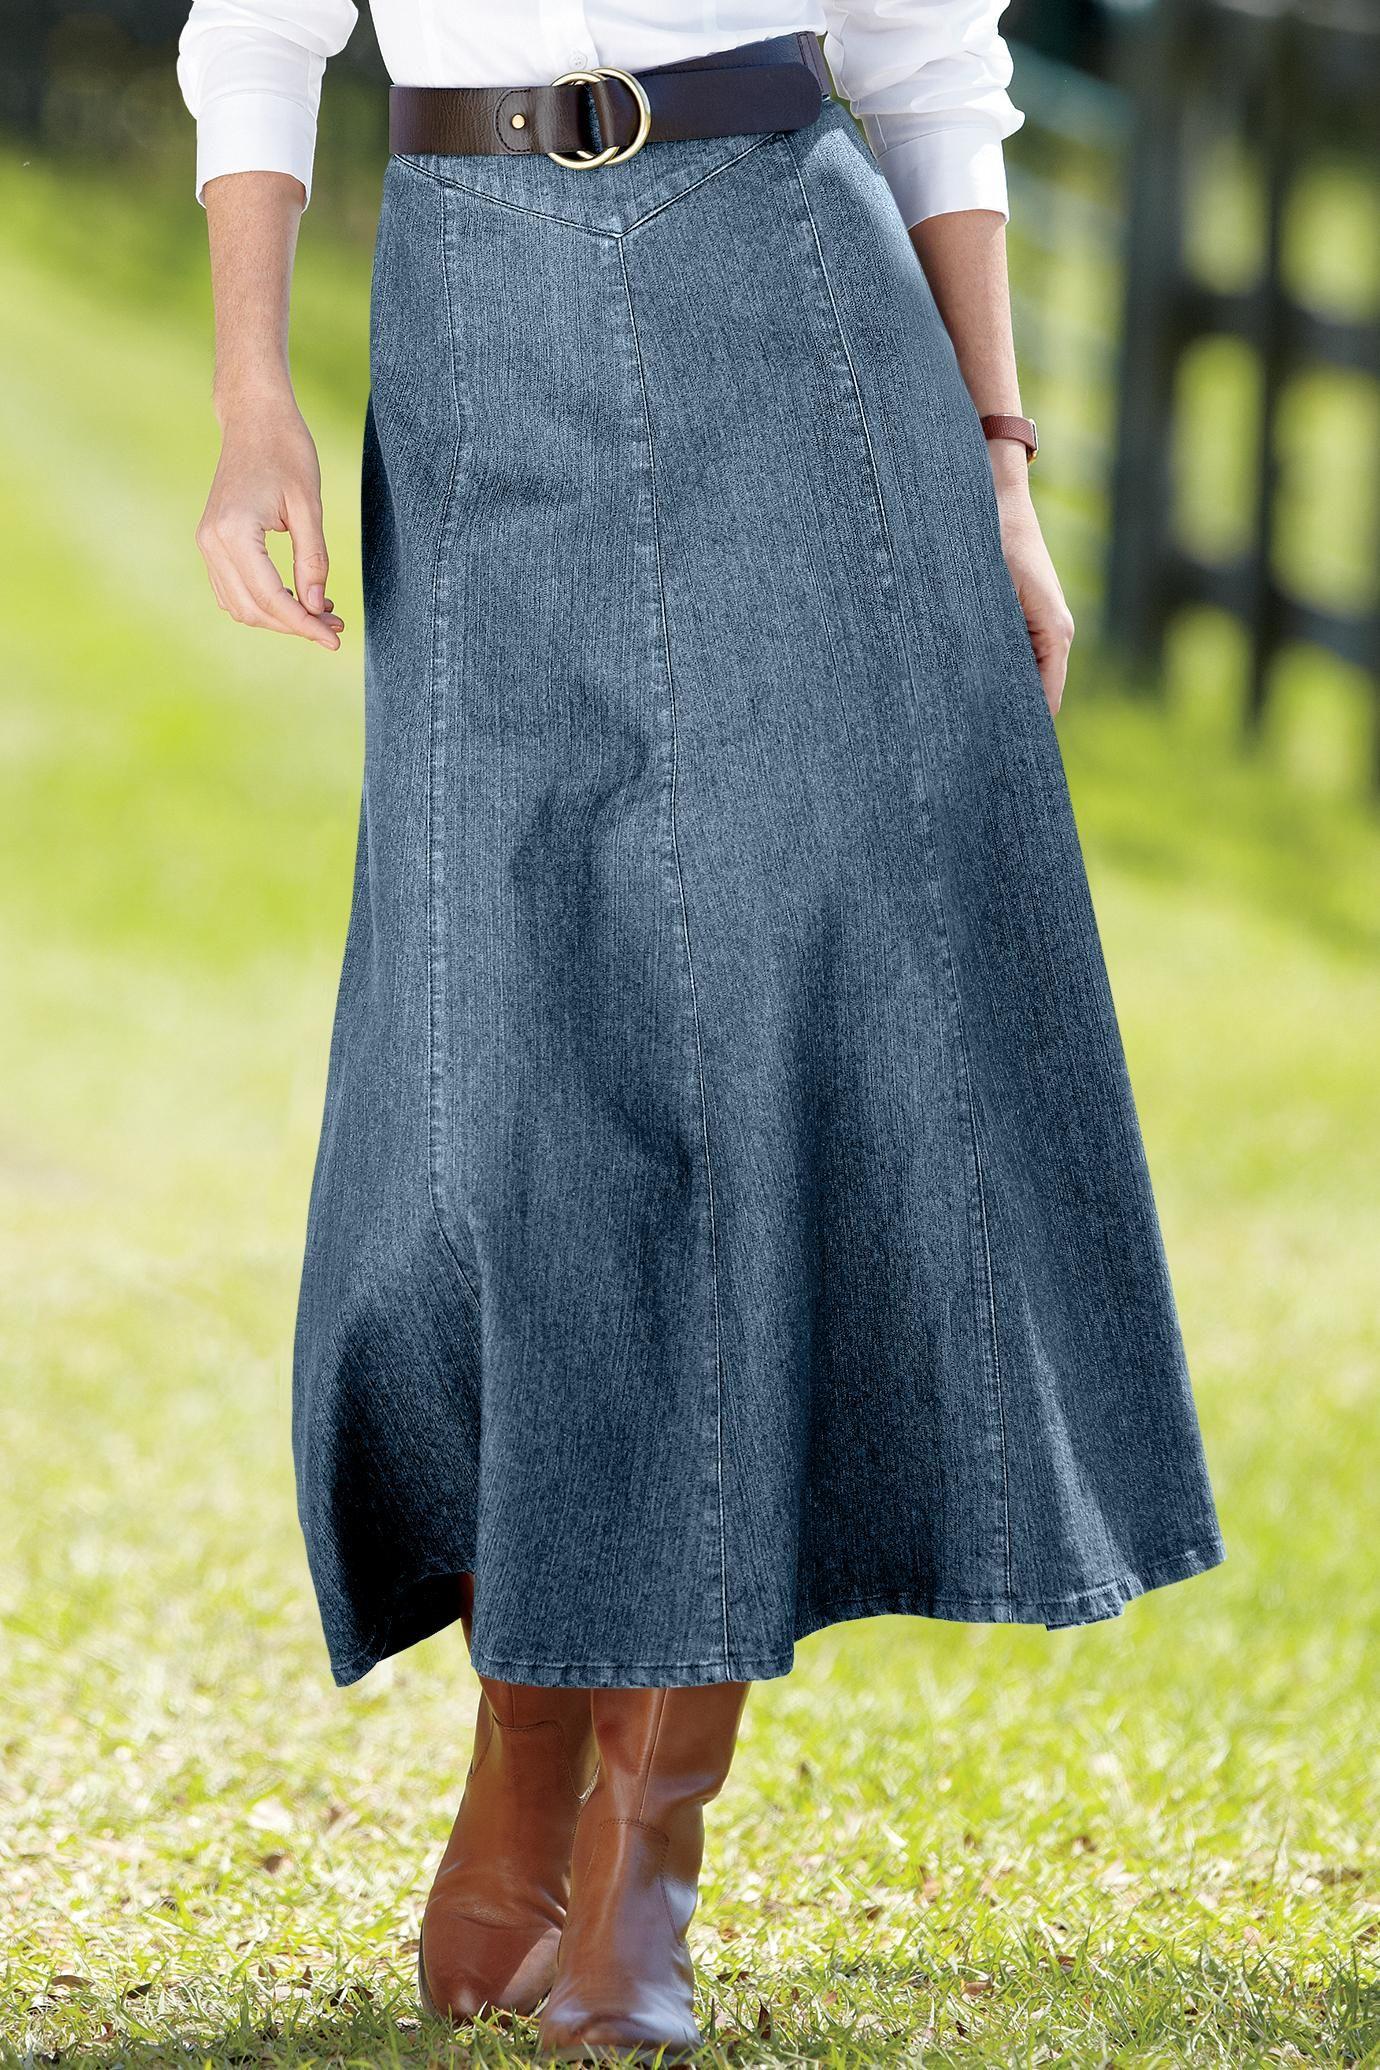 9721399f Long Denim Skirt Women's - love the long skirt with the boots! - k. 10/8/13